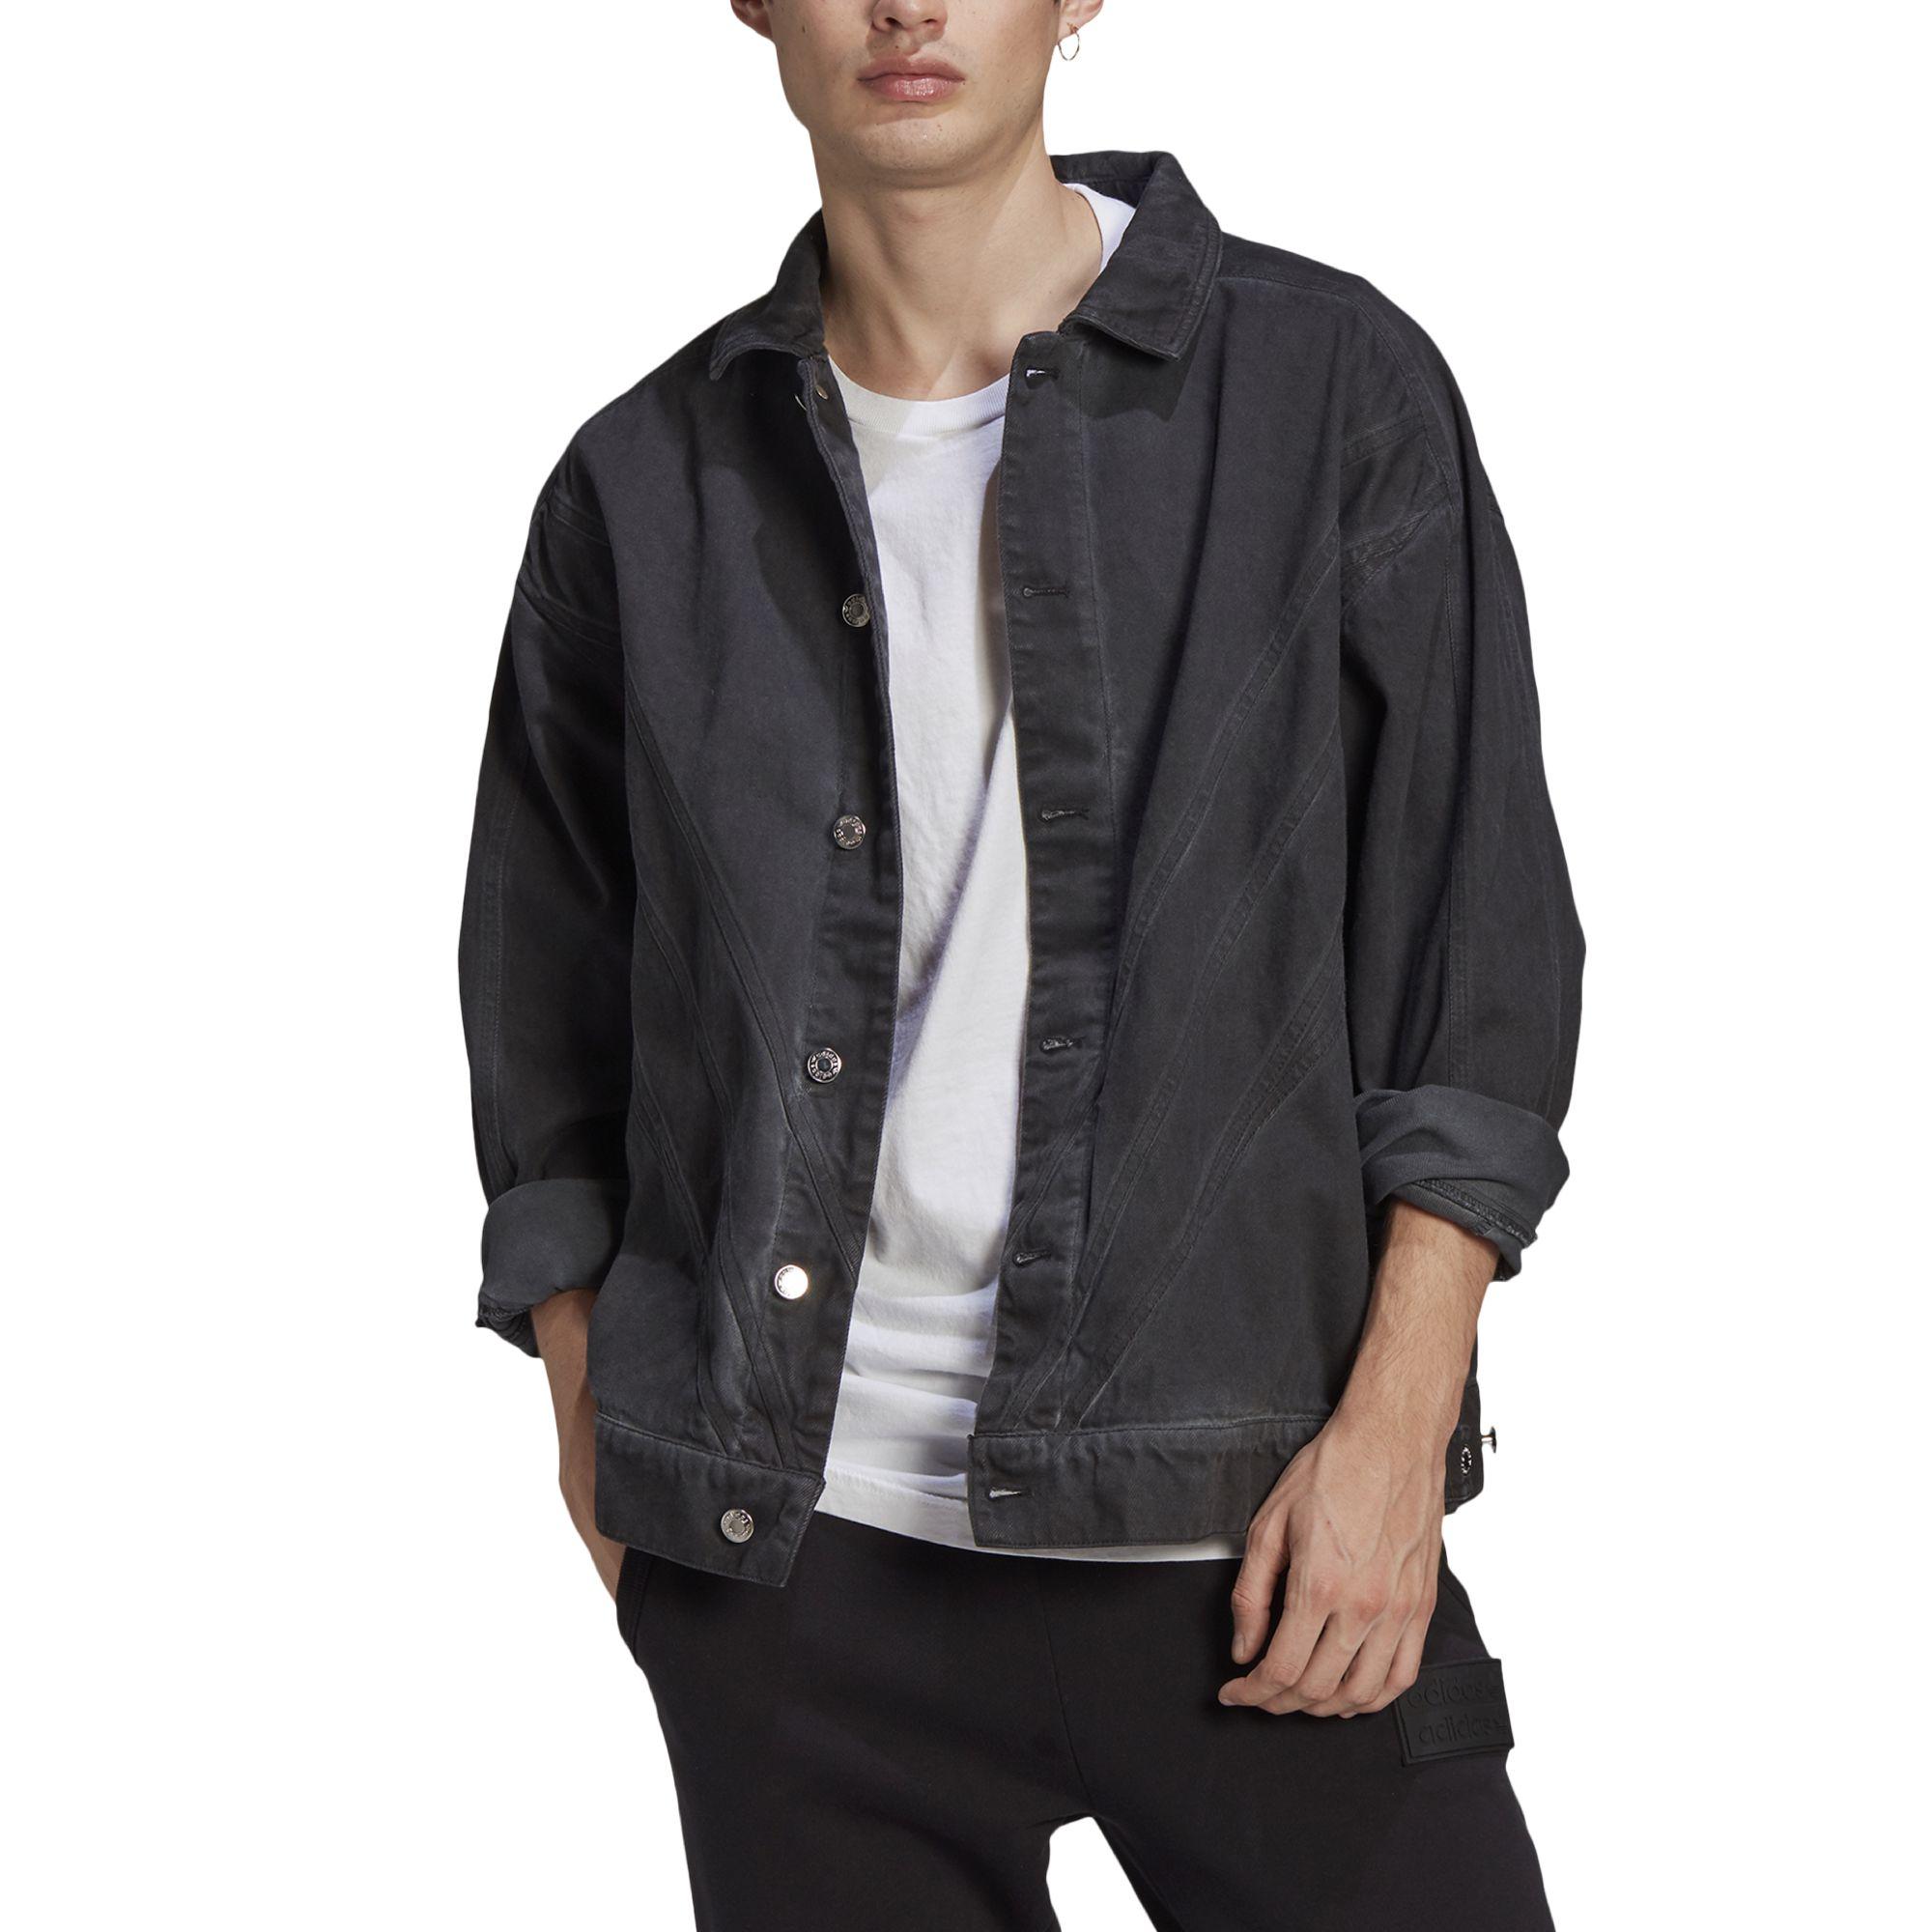 Adidas fshn denim jacket black